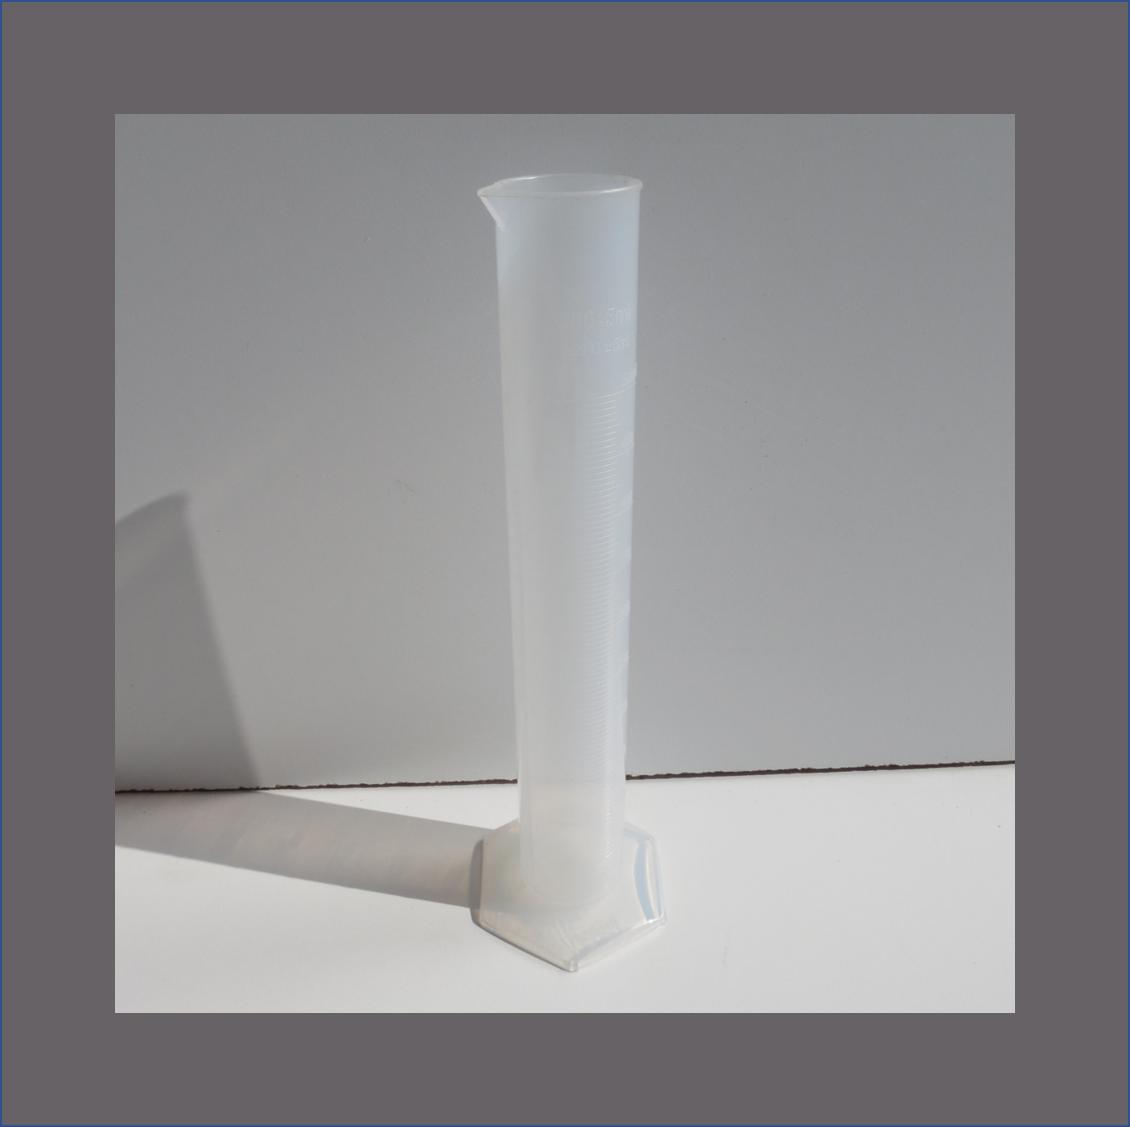 plastic-test-tubes-xl